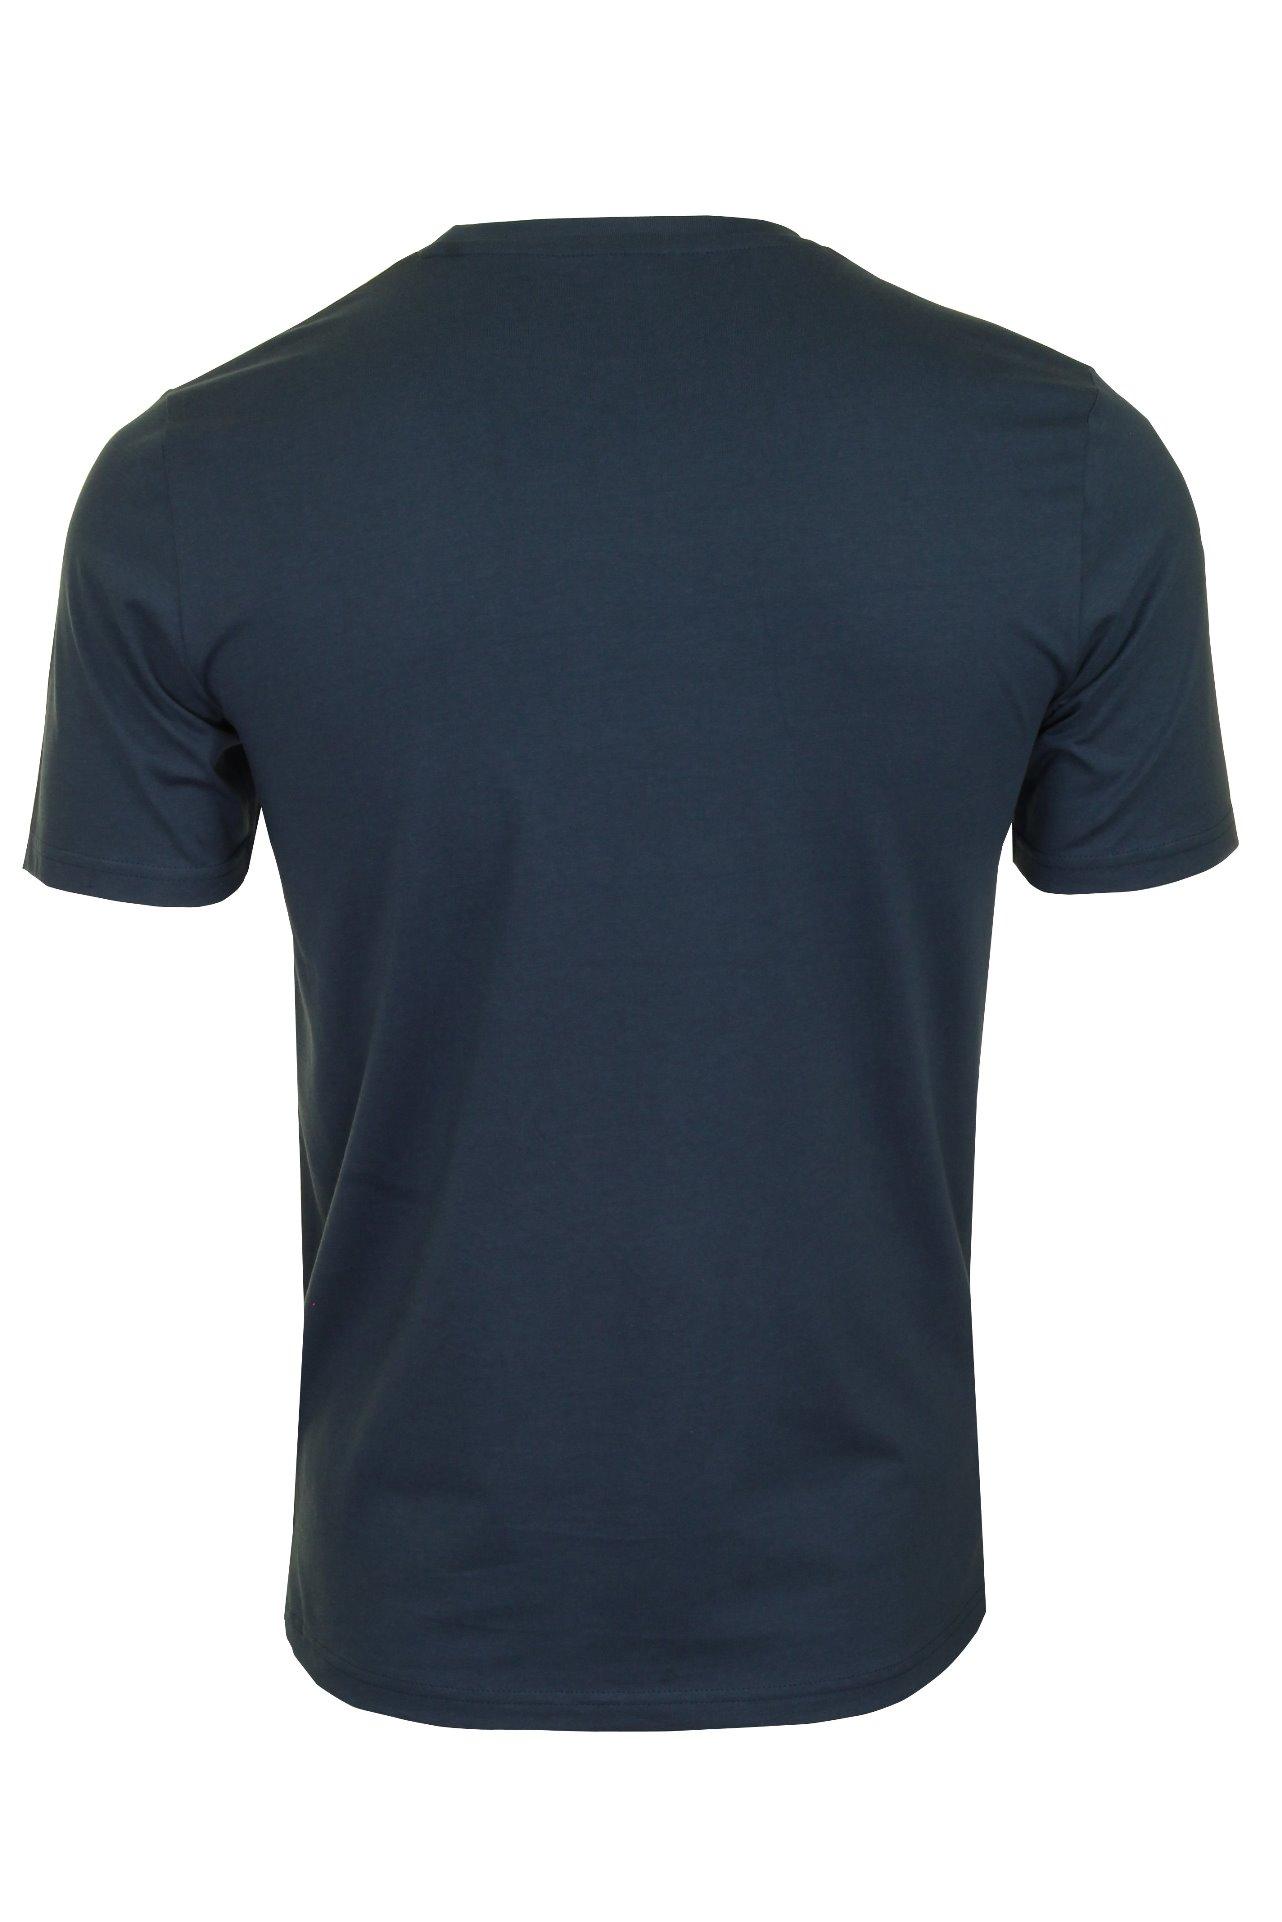 Tokyo-Laundry-Mens-Jersey-Crew-Neck-T-Shirt-039-San-Service-039 thumbnail 6